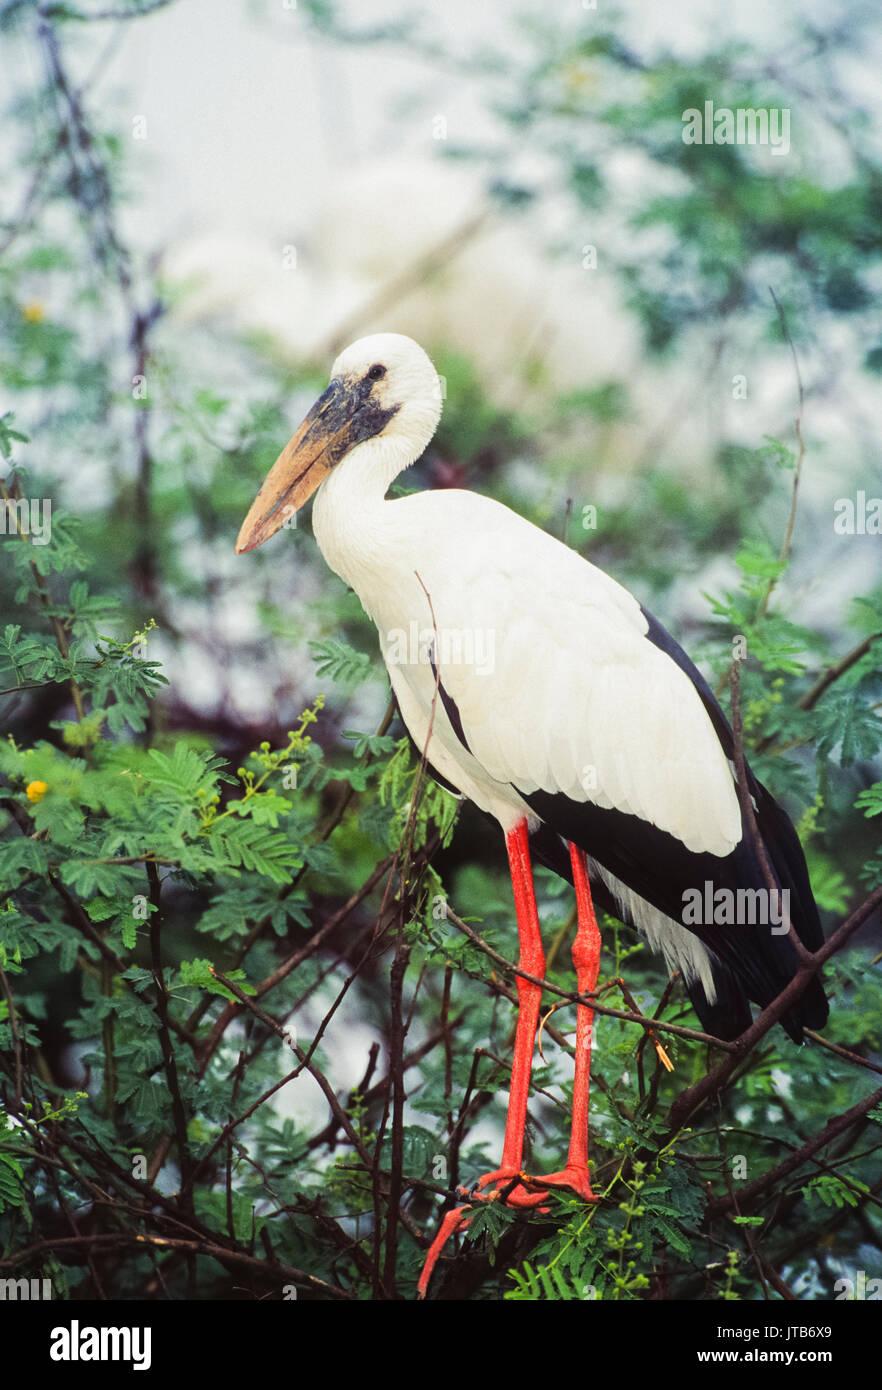 Asian Openbill or Asian Openbill stork, (Anastomus oscitans), Keoladeo Ghana National Park, Bharatpur, Rajasthan, India - Stock Image